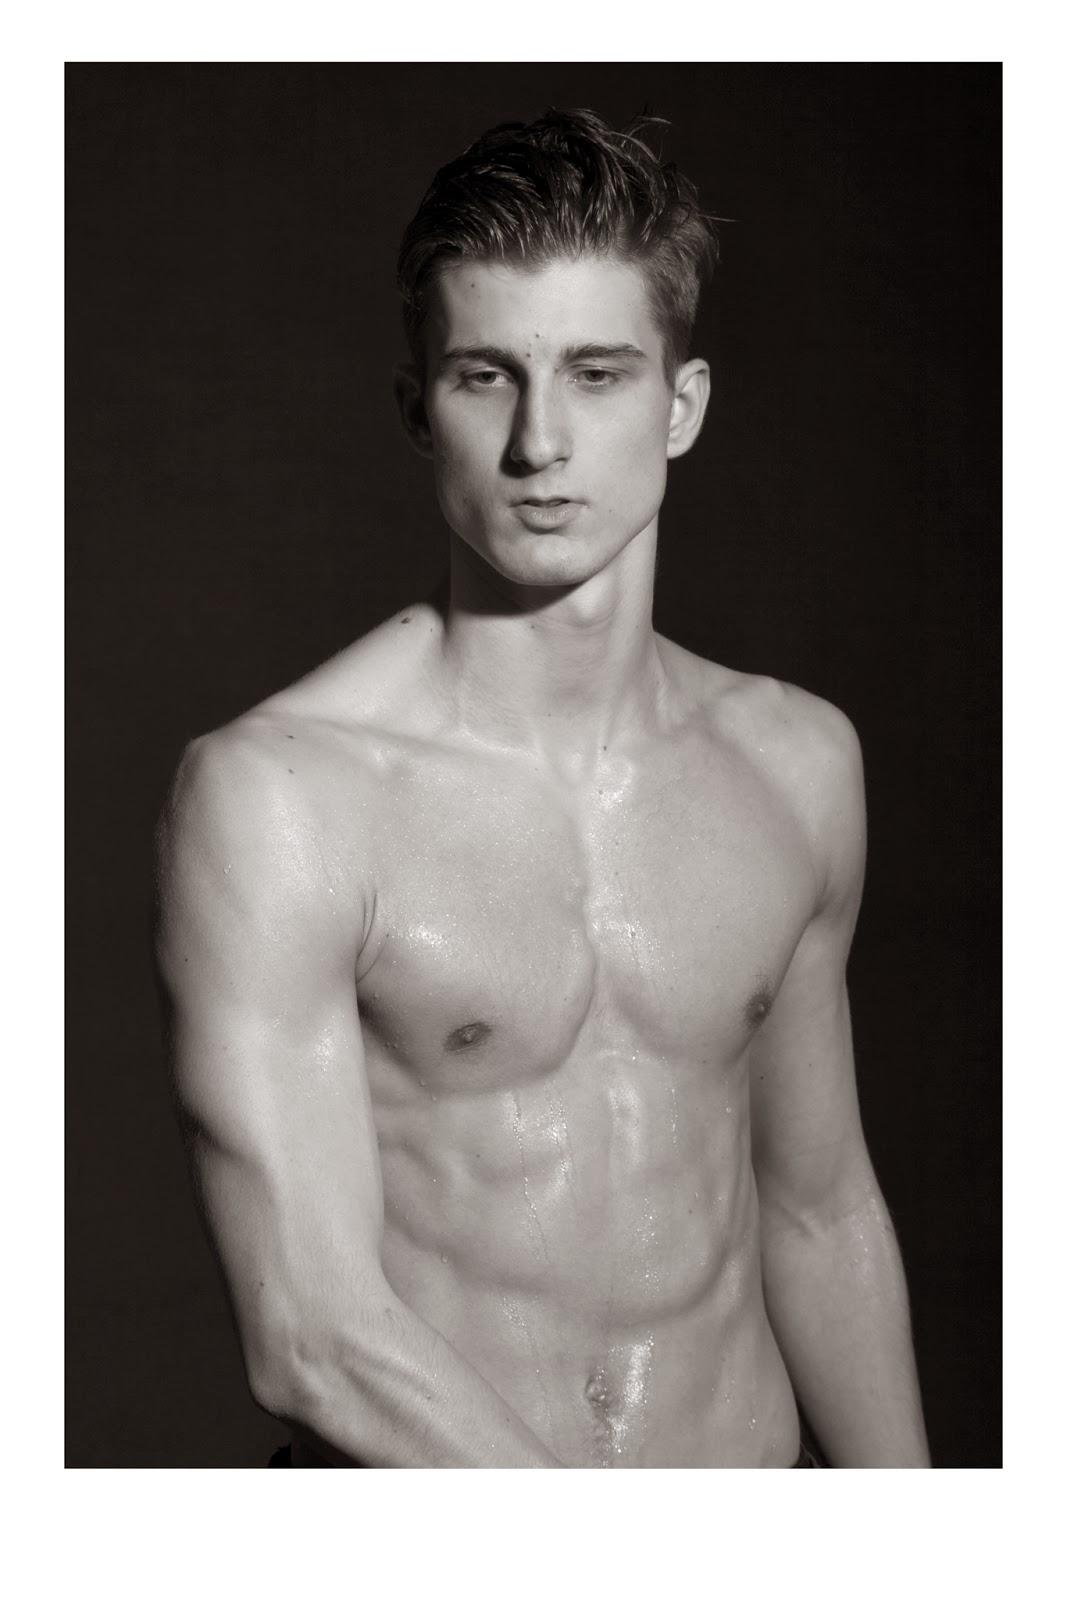 Der Stefashionist Fashion Passion Models Marc Schulze: Der Stefashionist: Fashion, Passion & Models: Dani Molnár